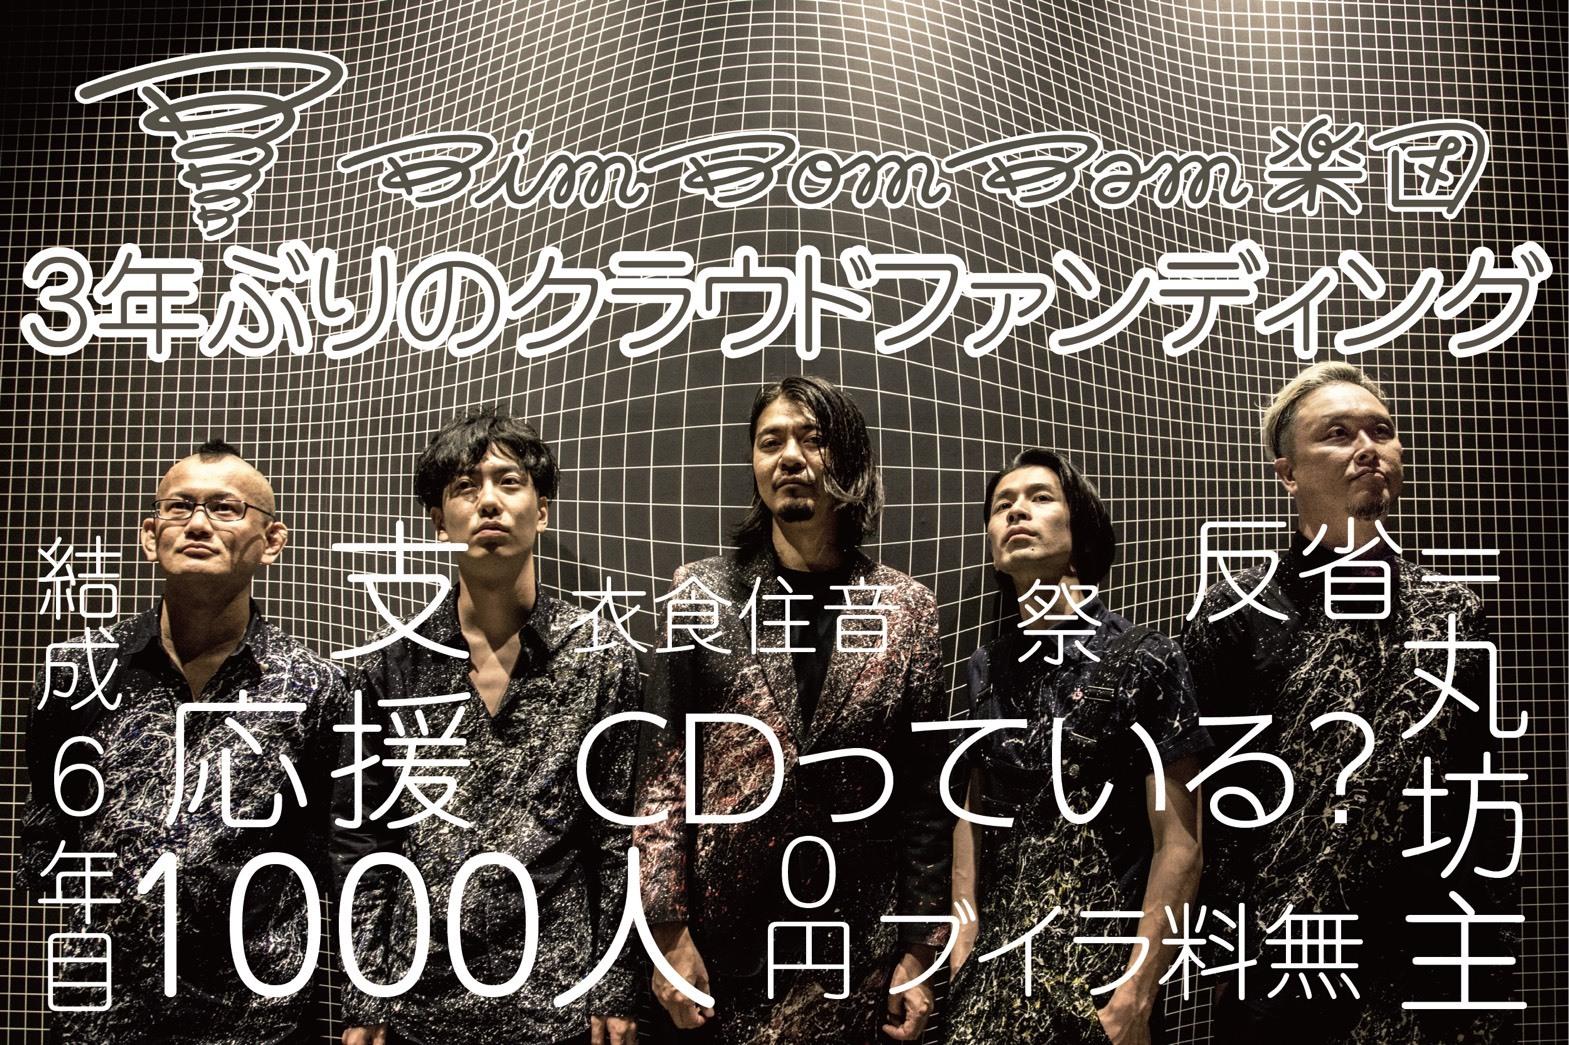 【BimBomBam楽団】クラウドファンディング参加者限定CD販売決定!1000人の方に応援・拡散していただきたい!!